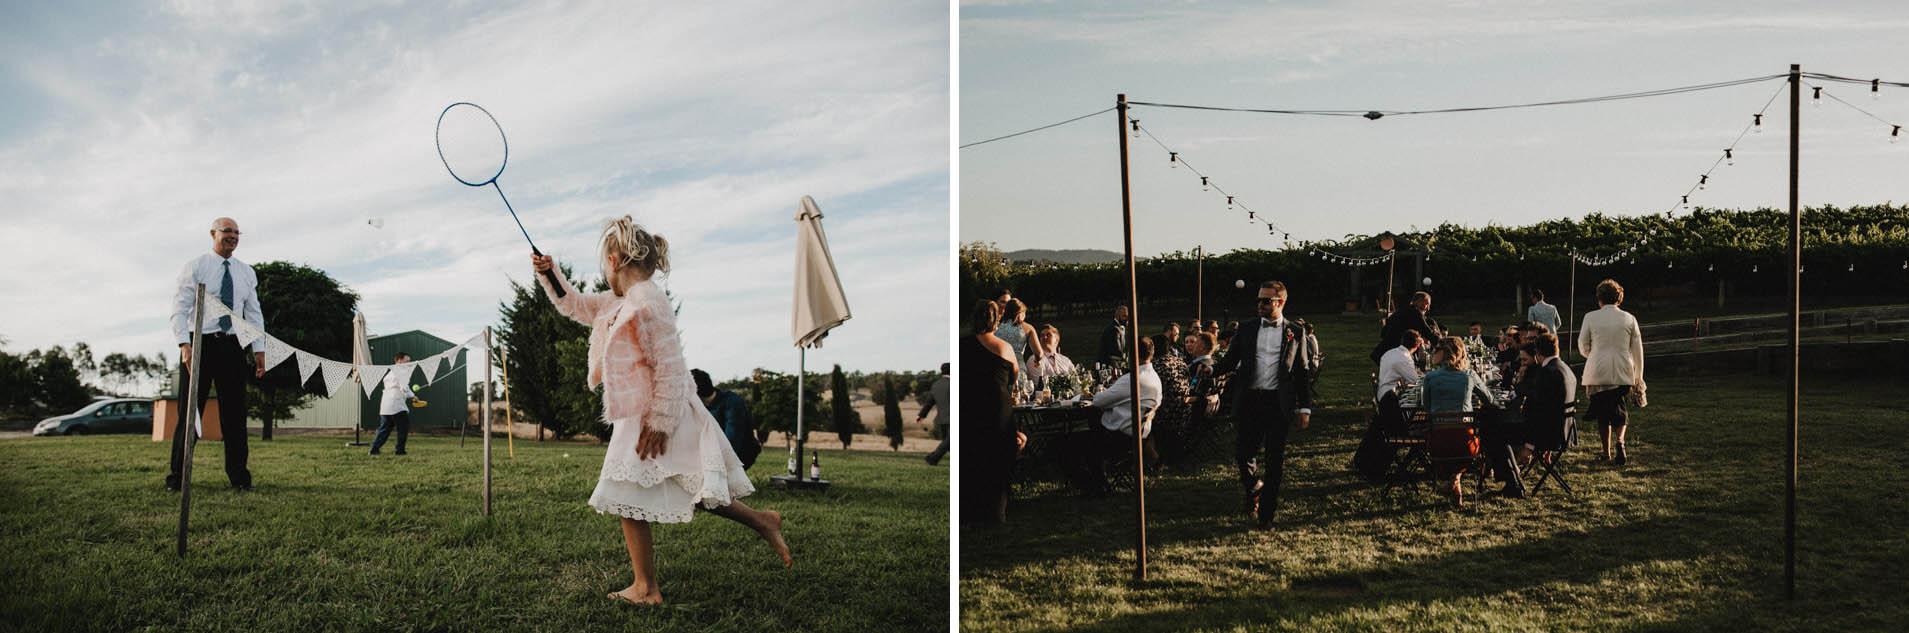 suger-pine-walk-wedding (Corinna & Dylan)_214(2510)2.jpg